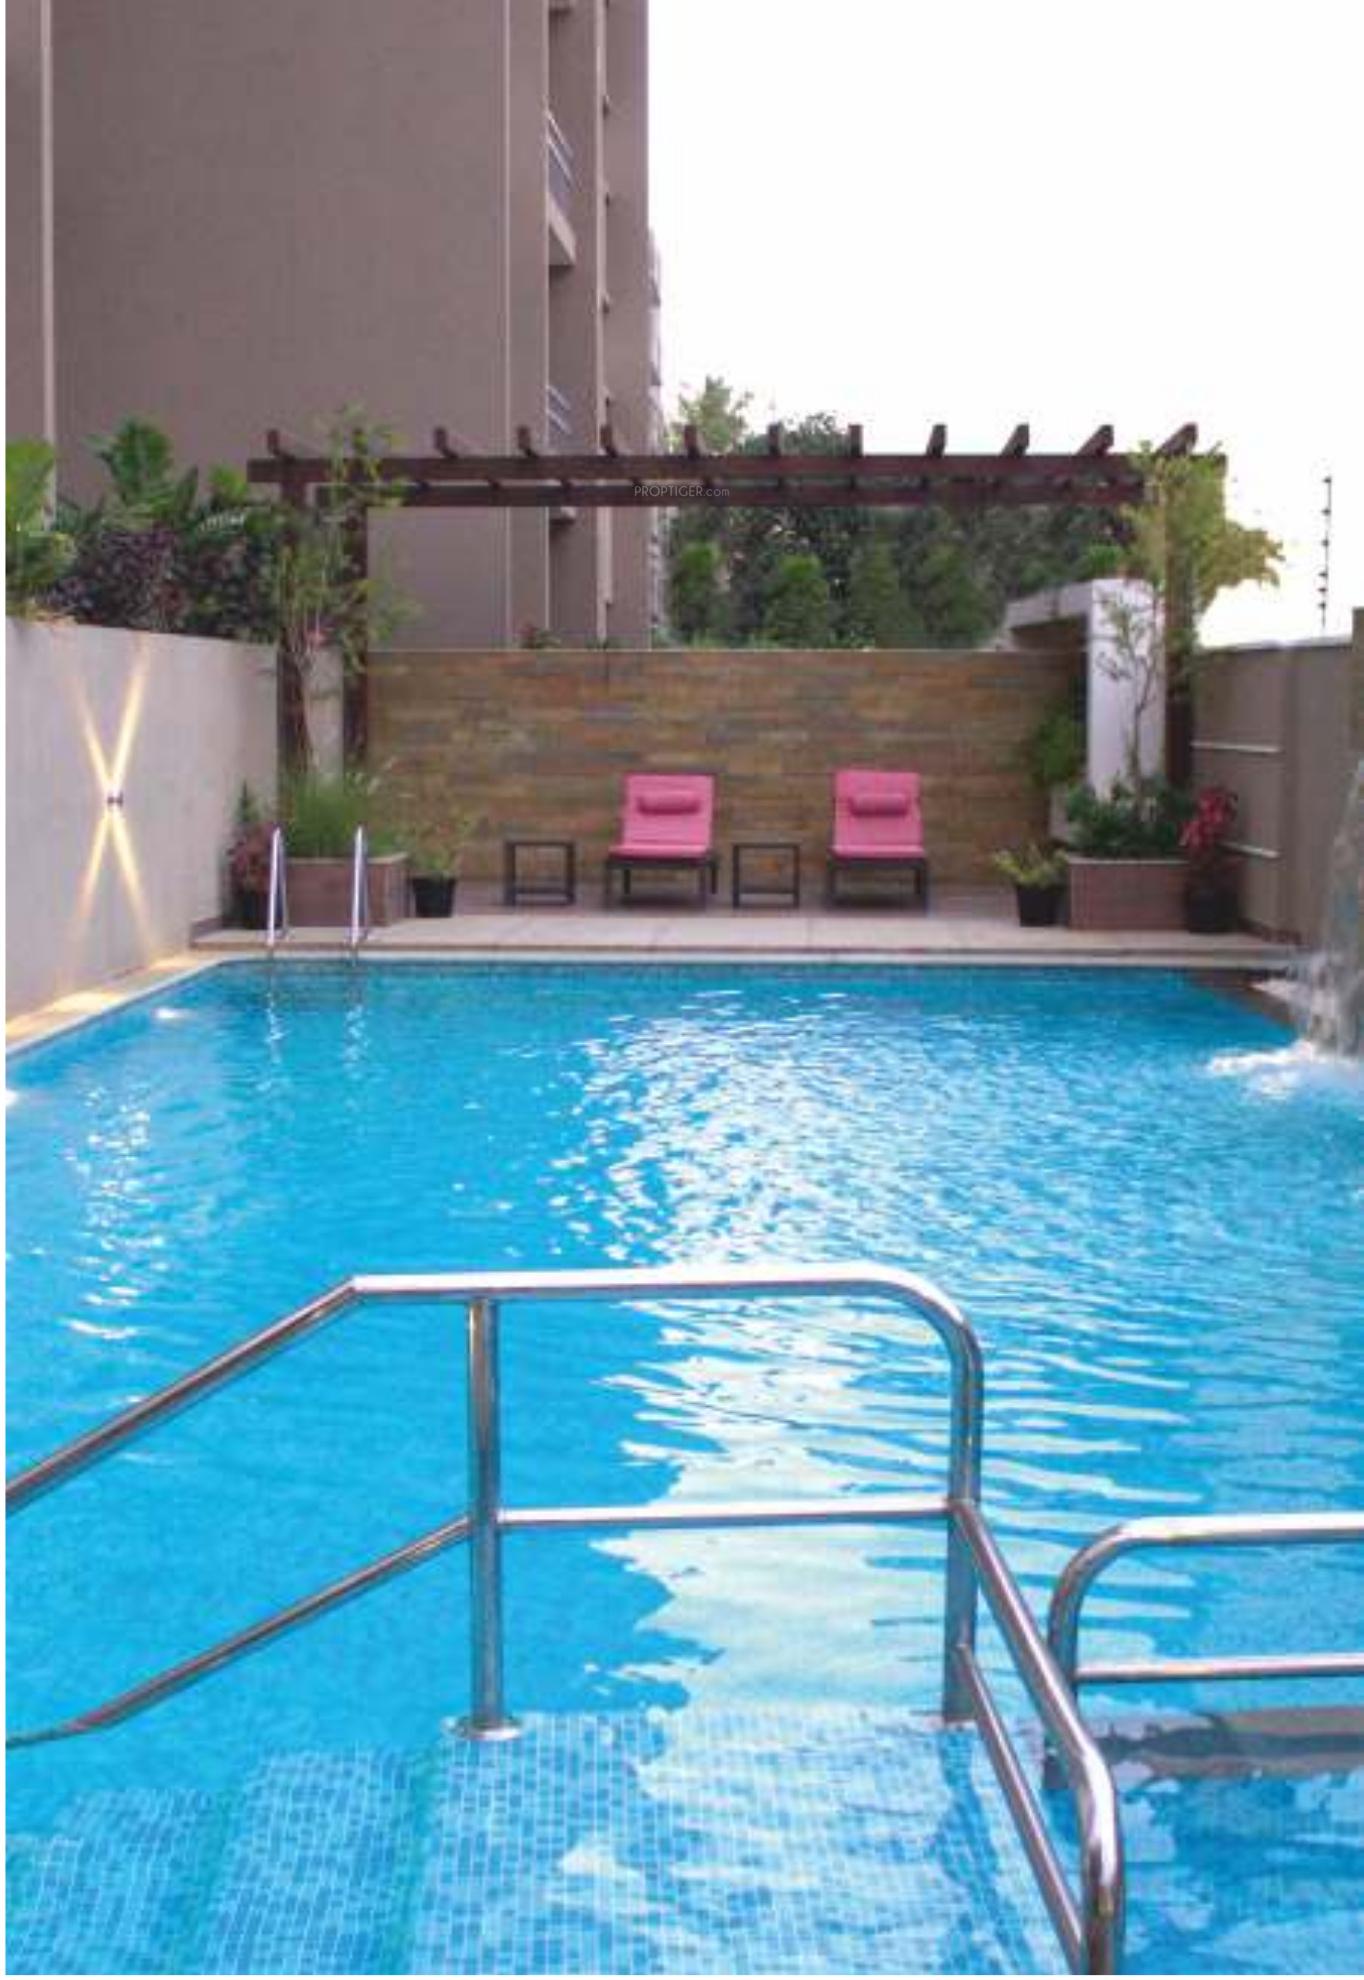 Legacy ariston in yelahanka bangalore price location - Swimming pool builders in bangalore ...